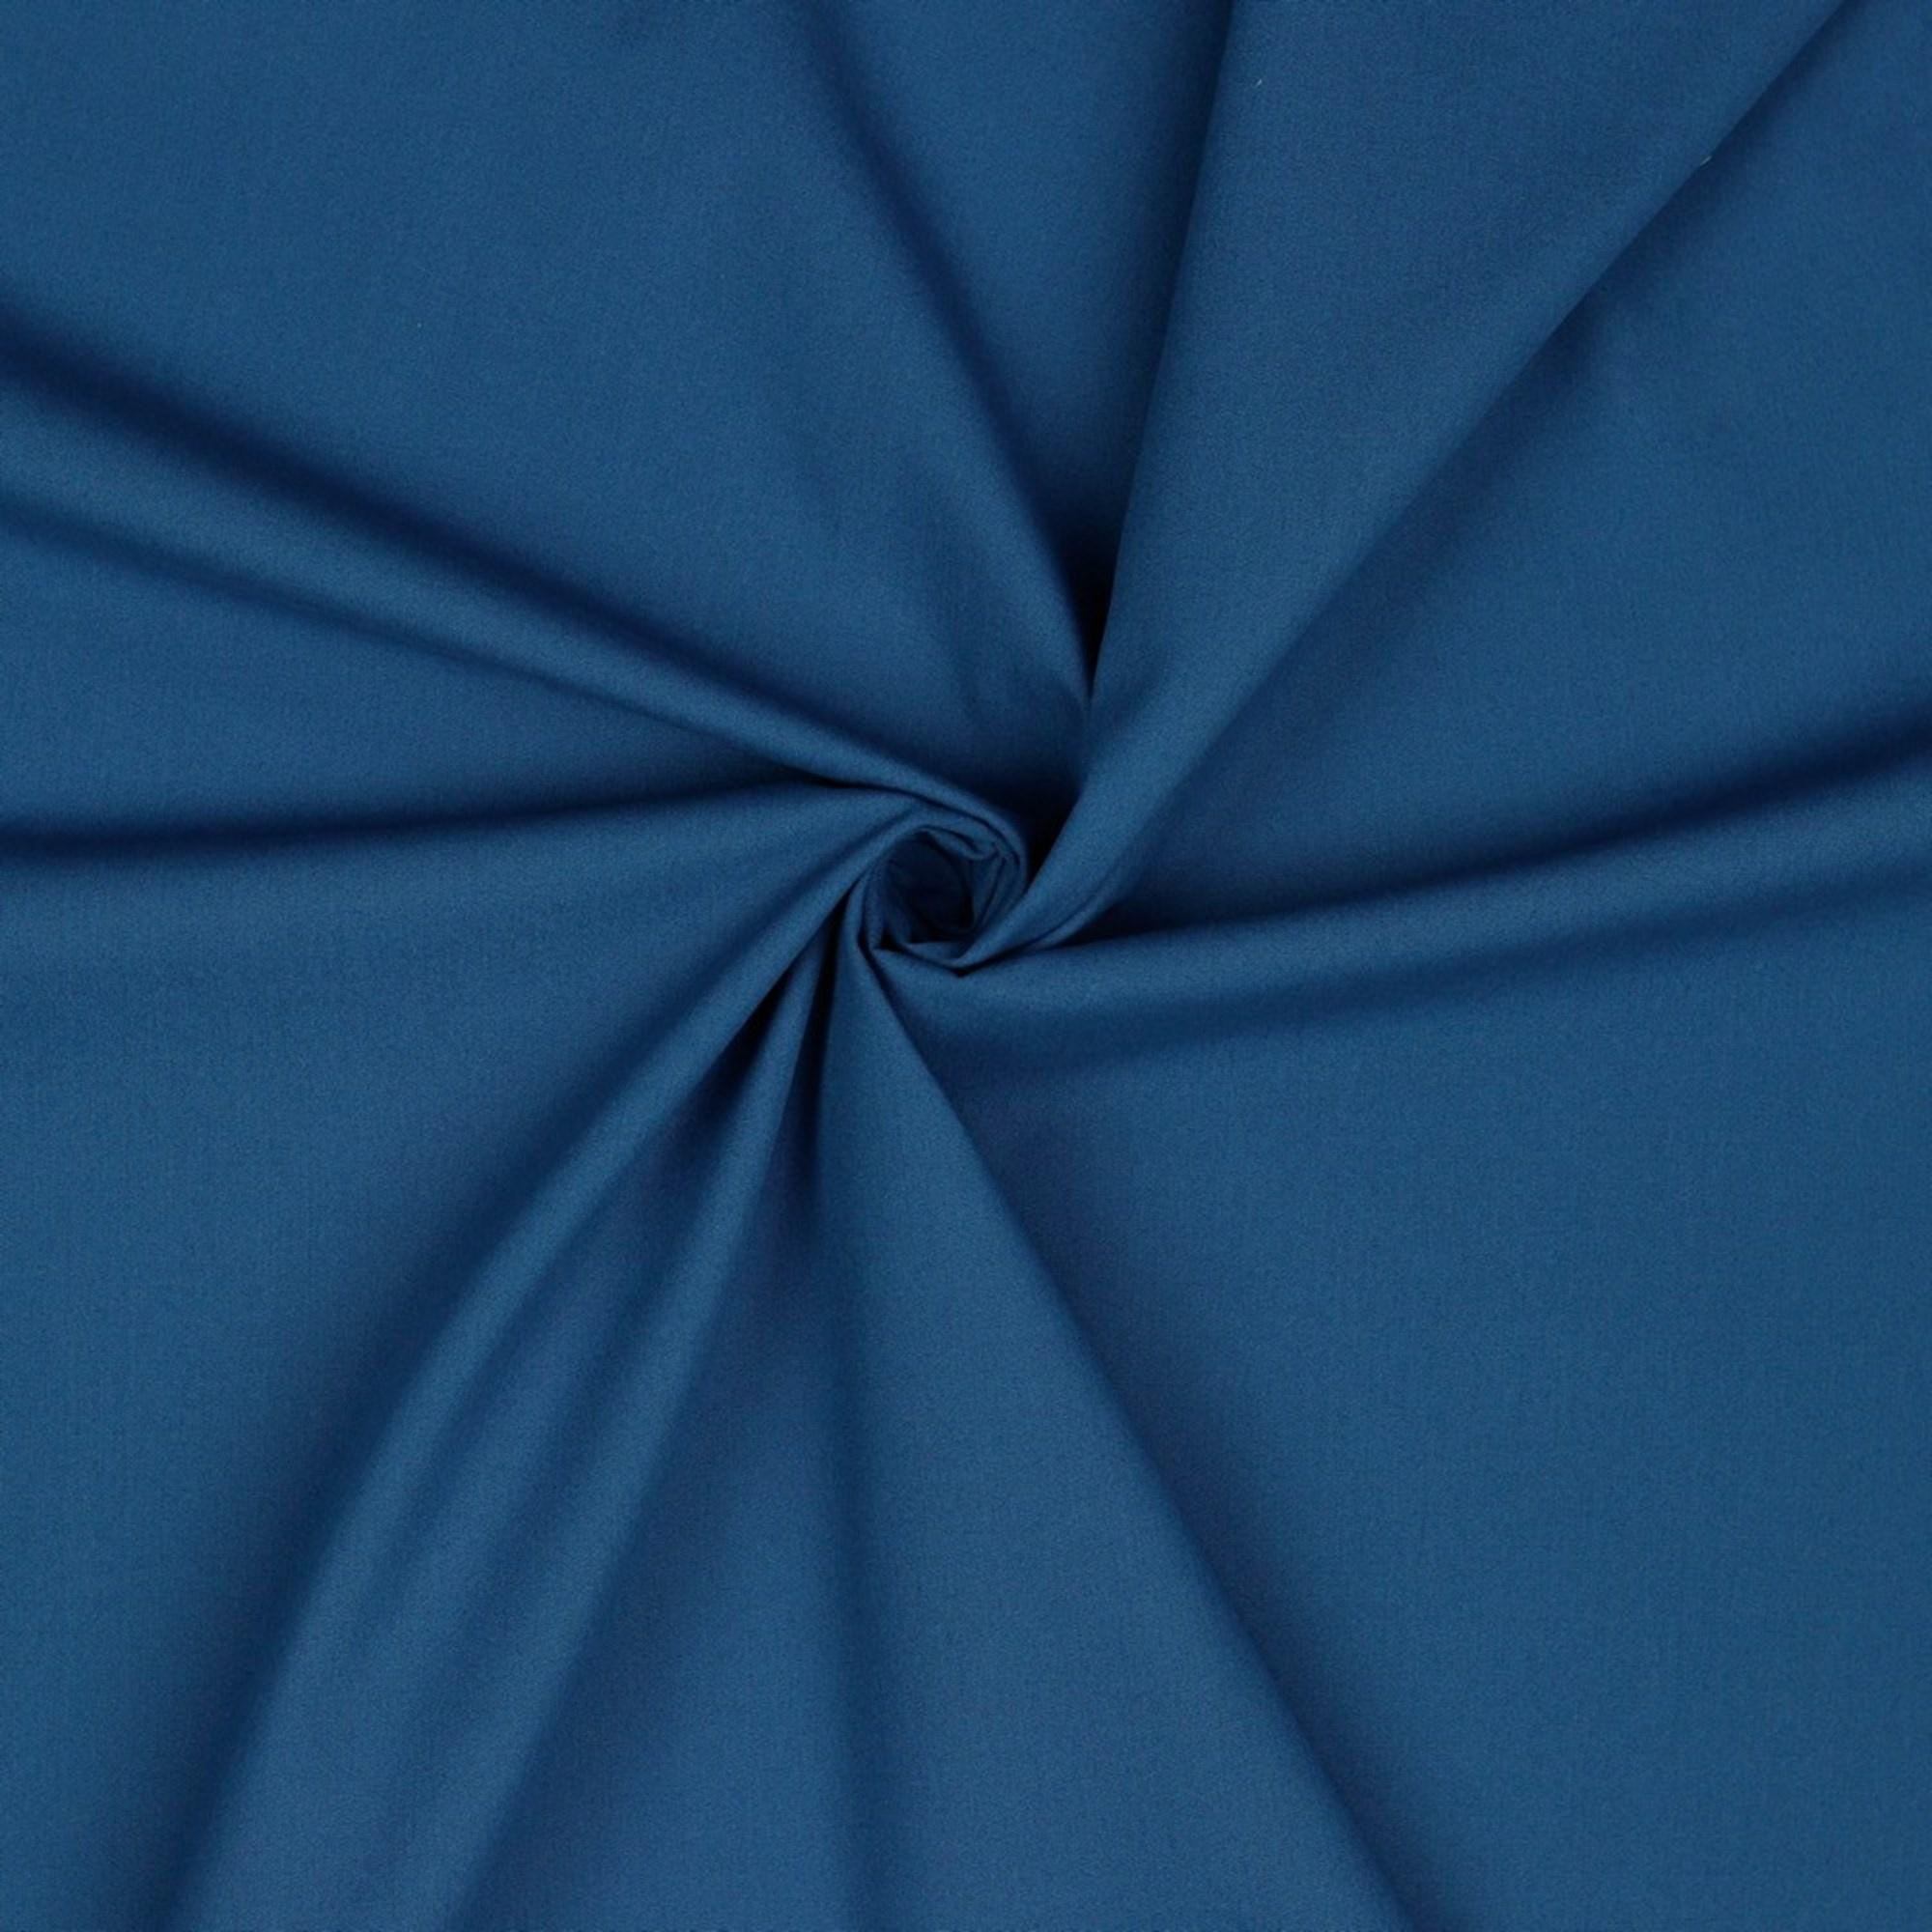 Candy Cotton - Blauw-1